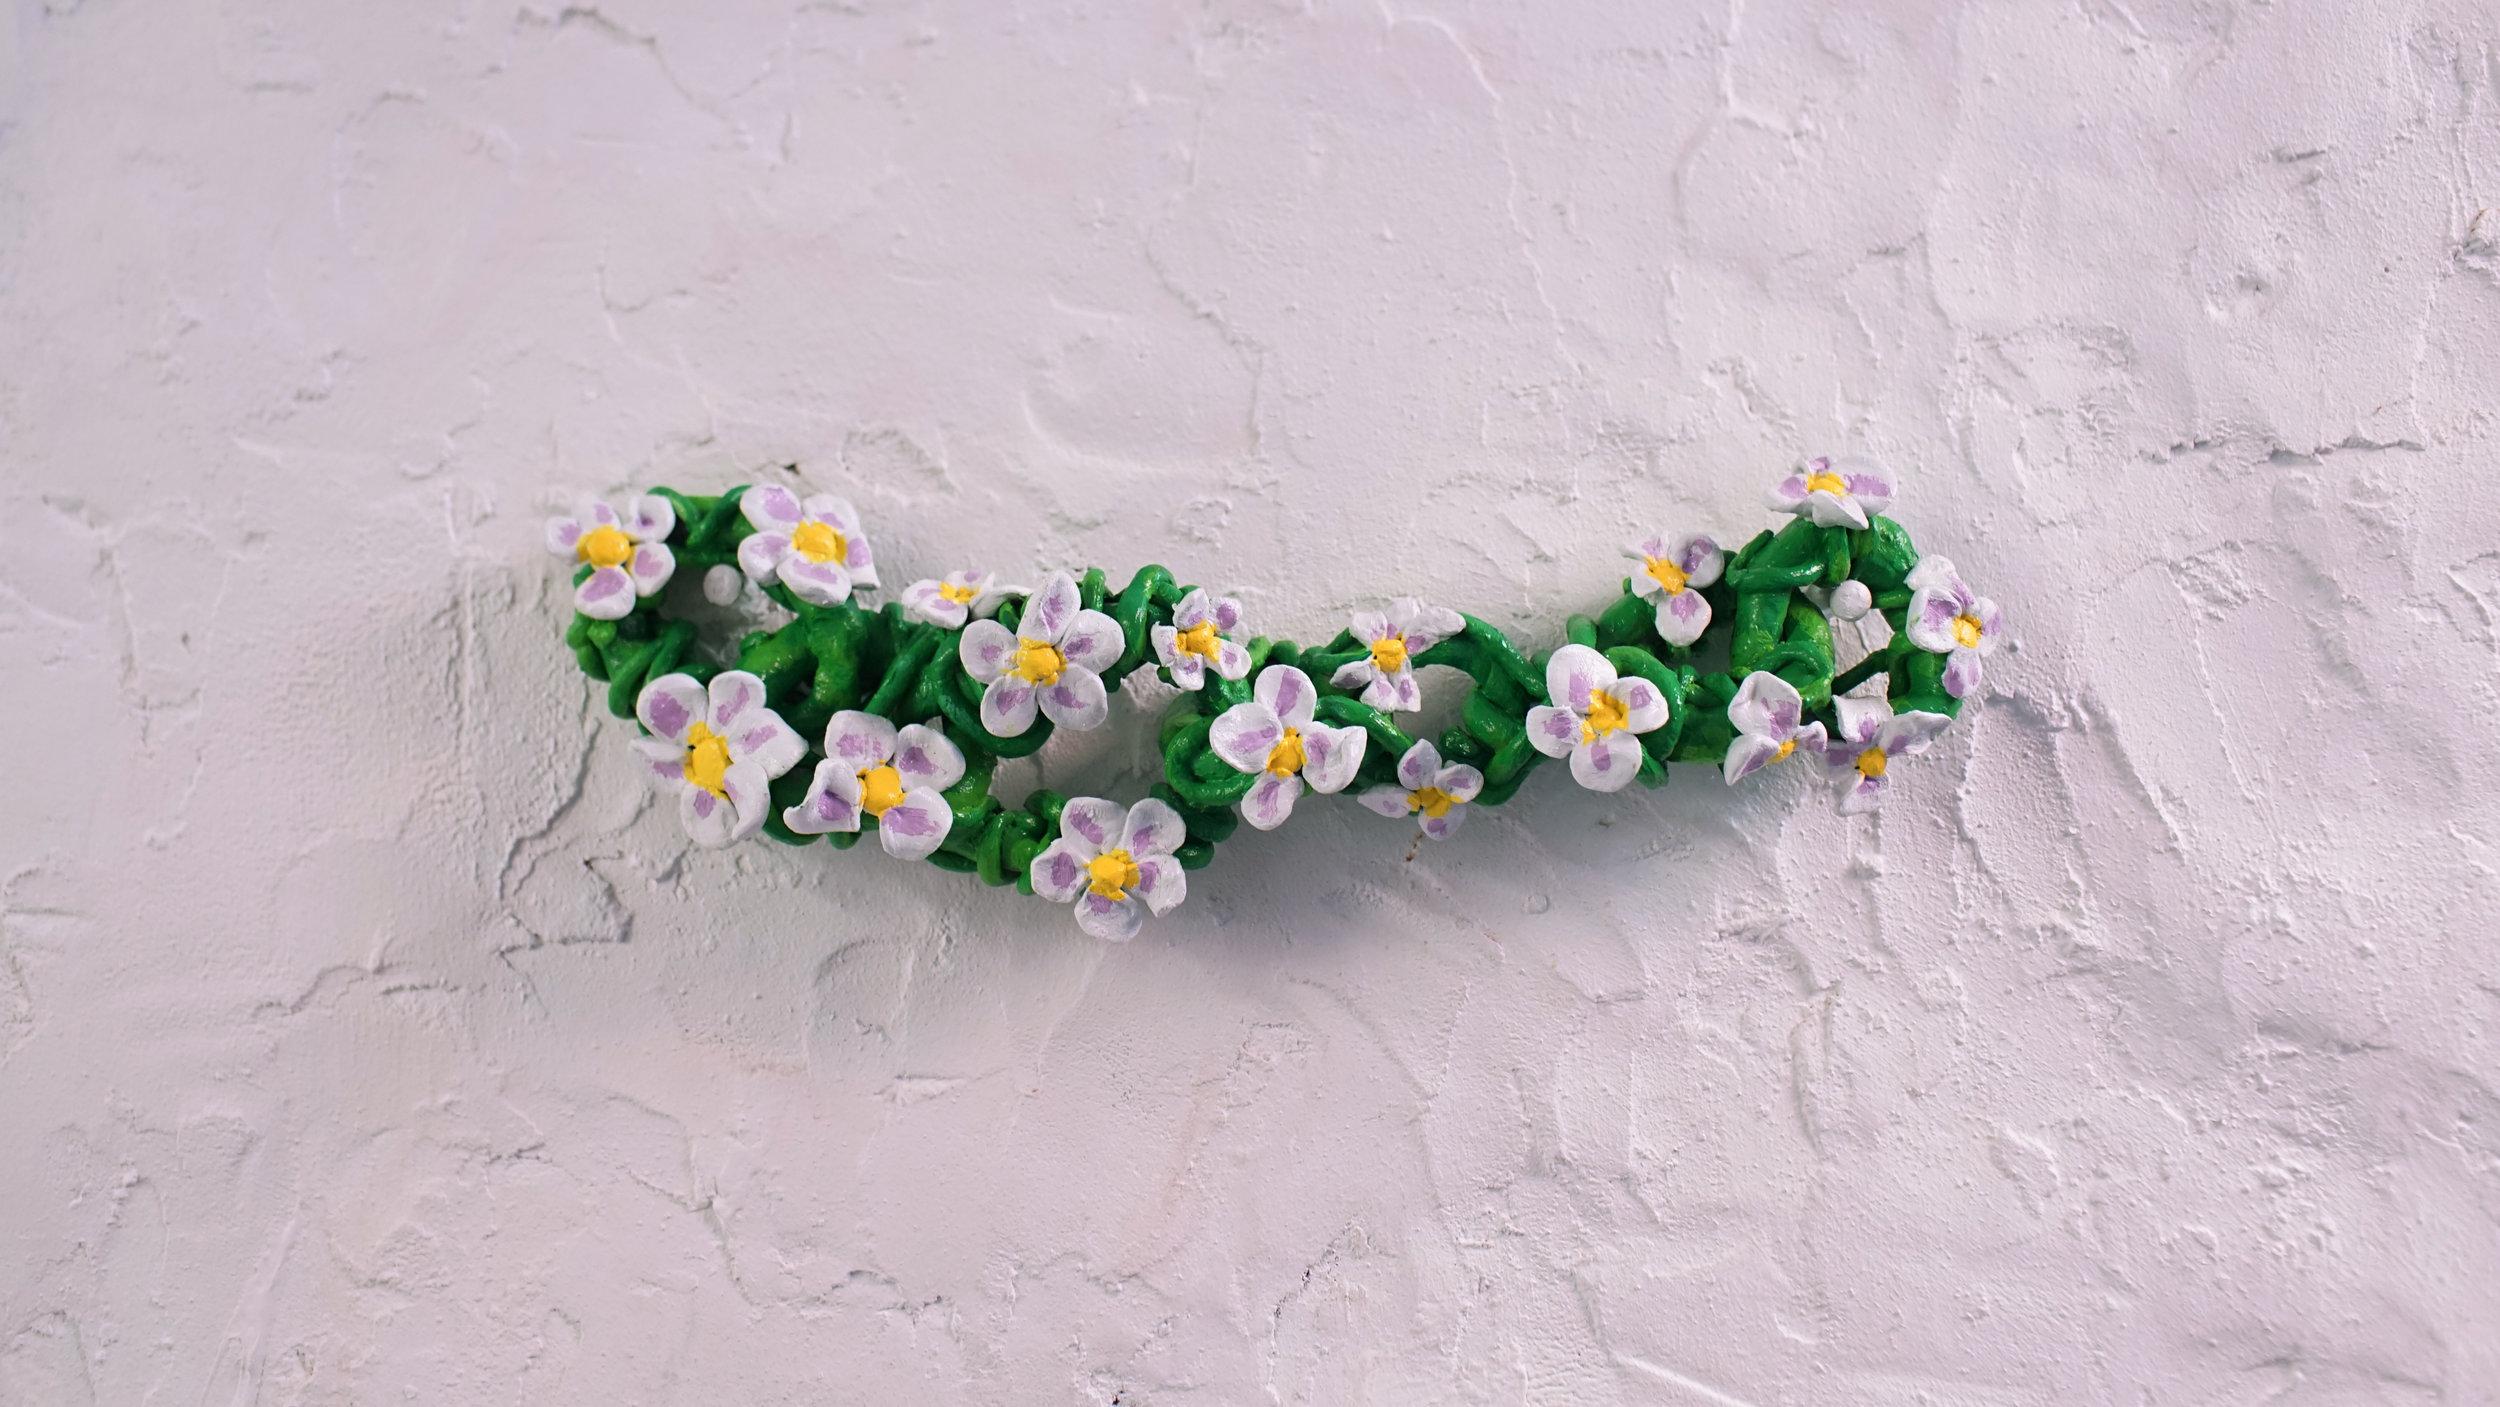 Daisy Chain 2.jpg